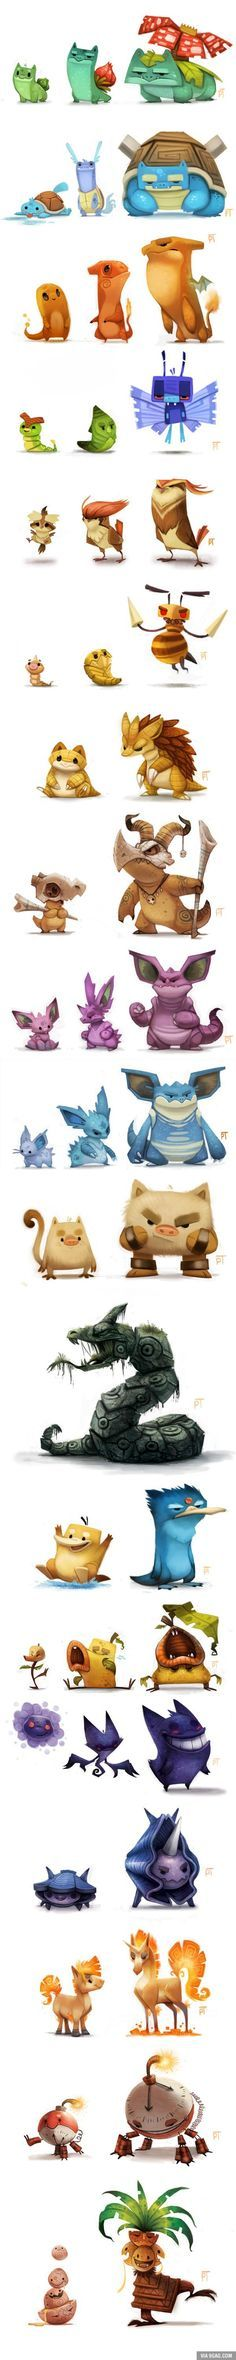 Insane Pokemon art (By Piper Thibodeau). Character design and concept art illustration. Fan Art Pokemon, Les Pokemon, Pokemon Remake, Game Character, Character Concept, Concept Art, Character Drawing, Illustration, Pokemon Pictures